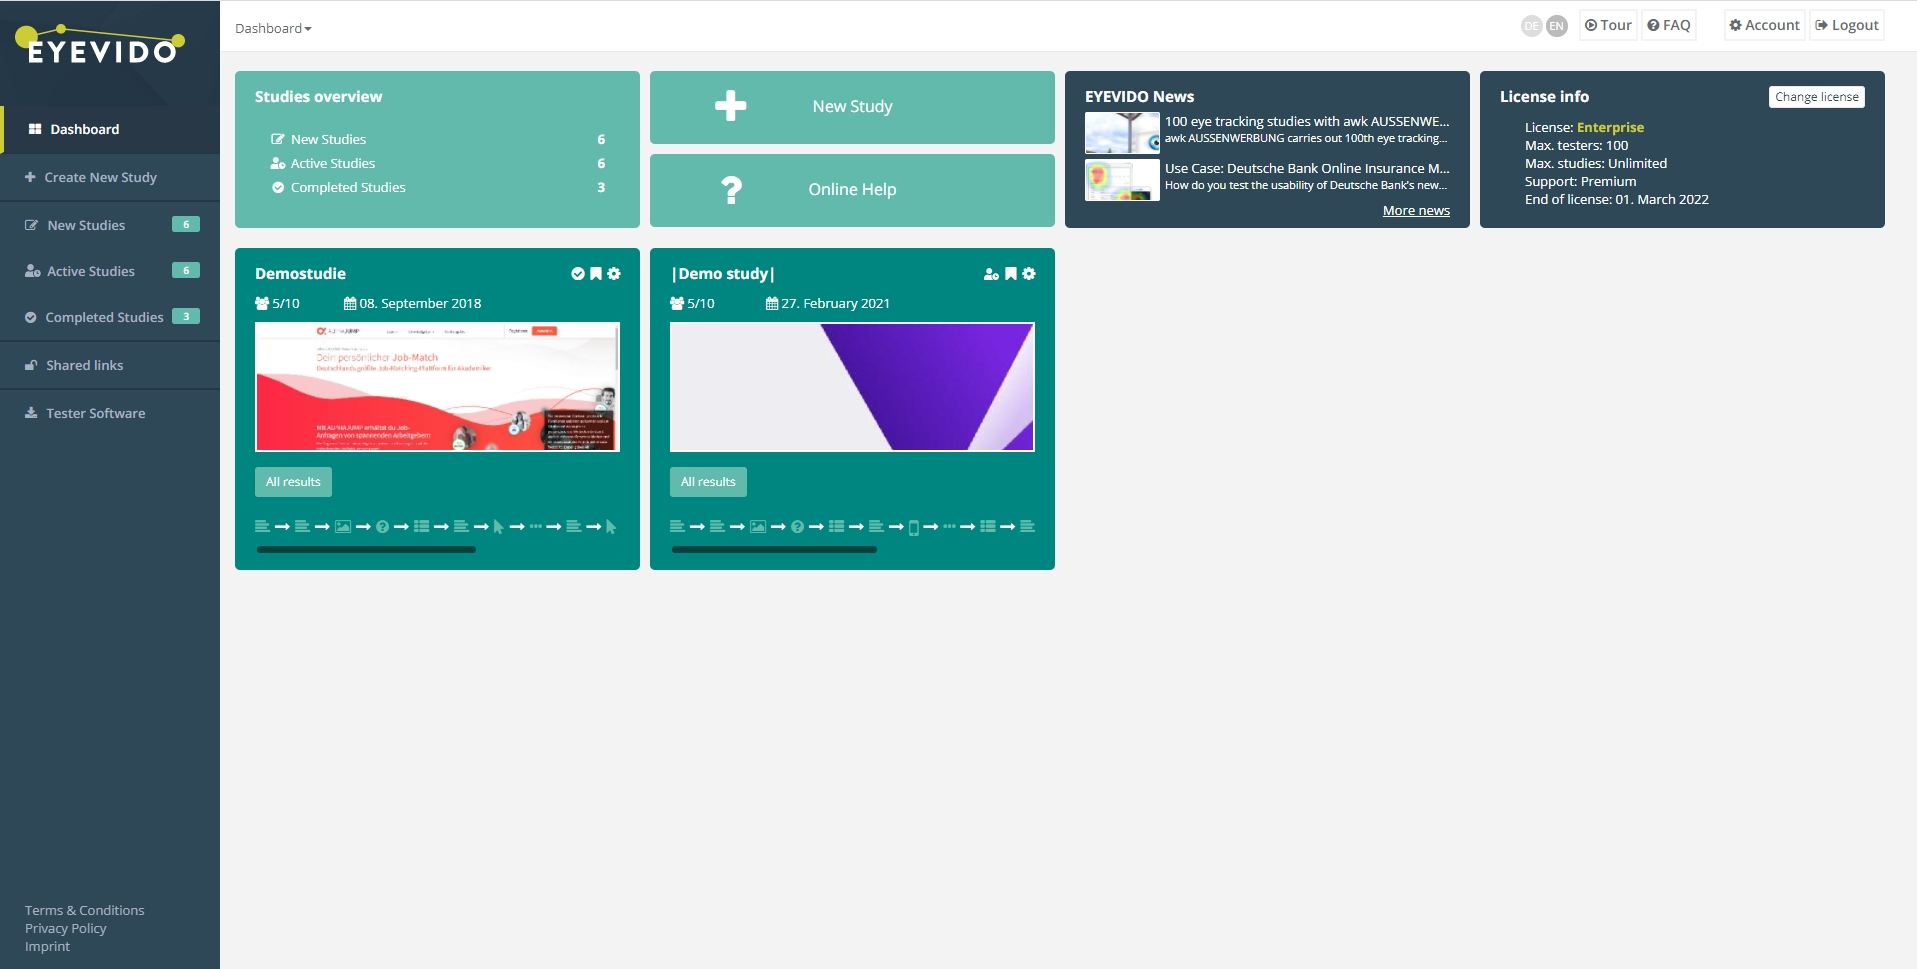 EYEVIDO Lab Dashboard